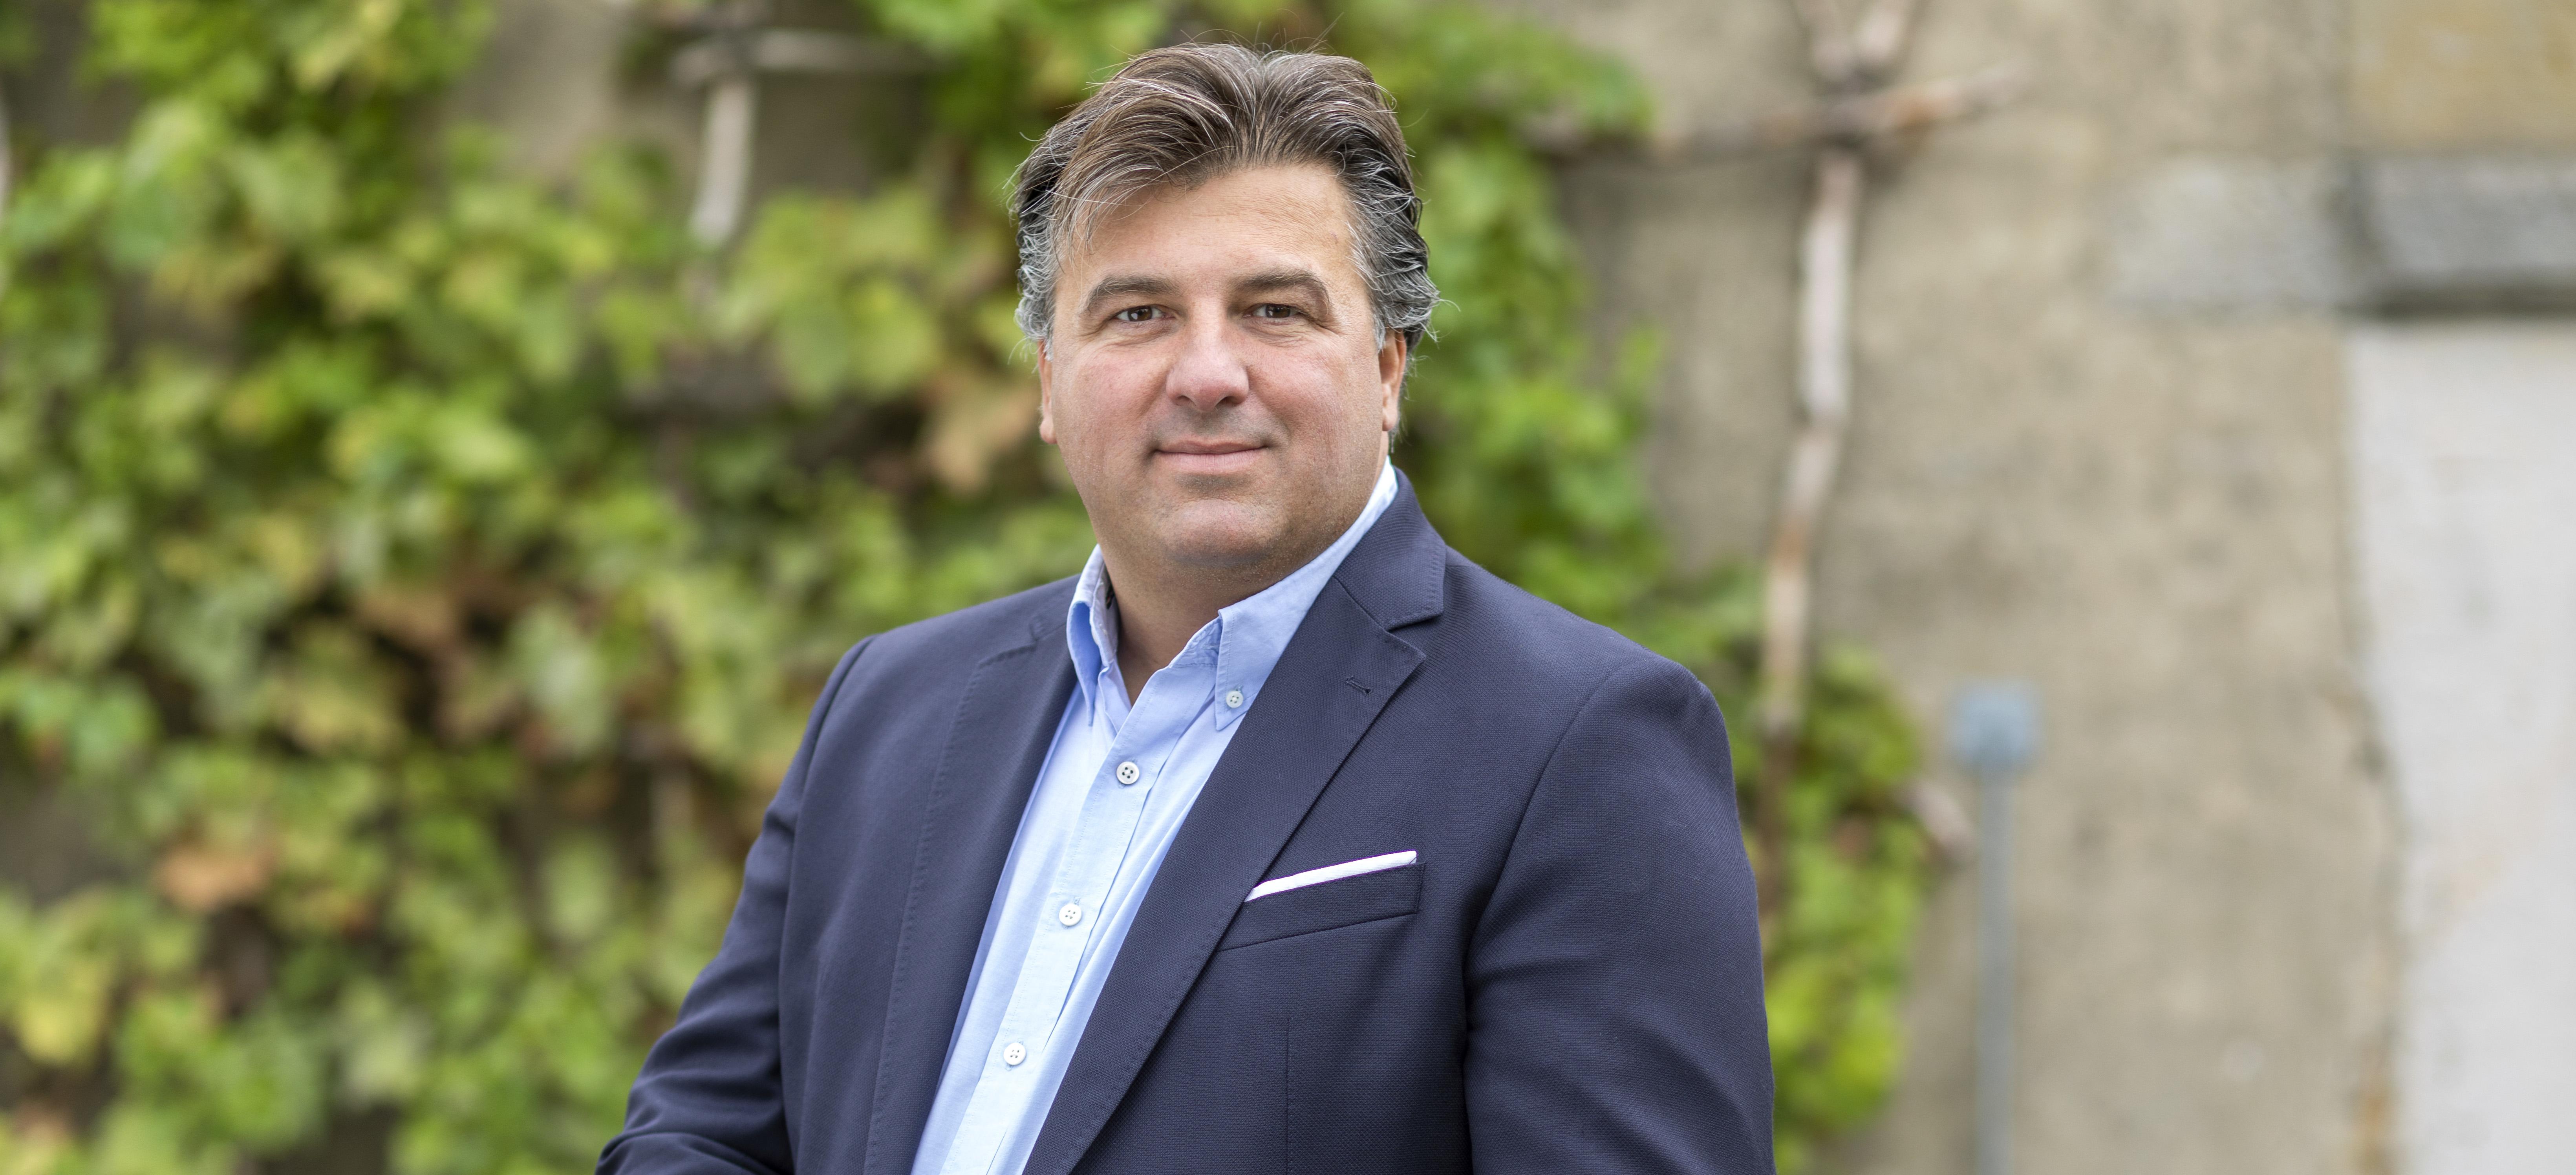 Gesichter Dirk Oliver Haller